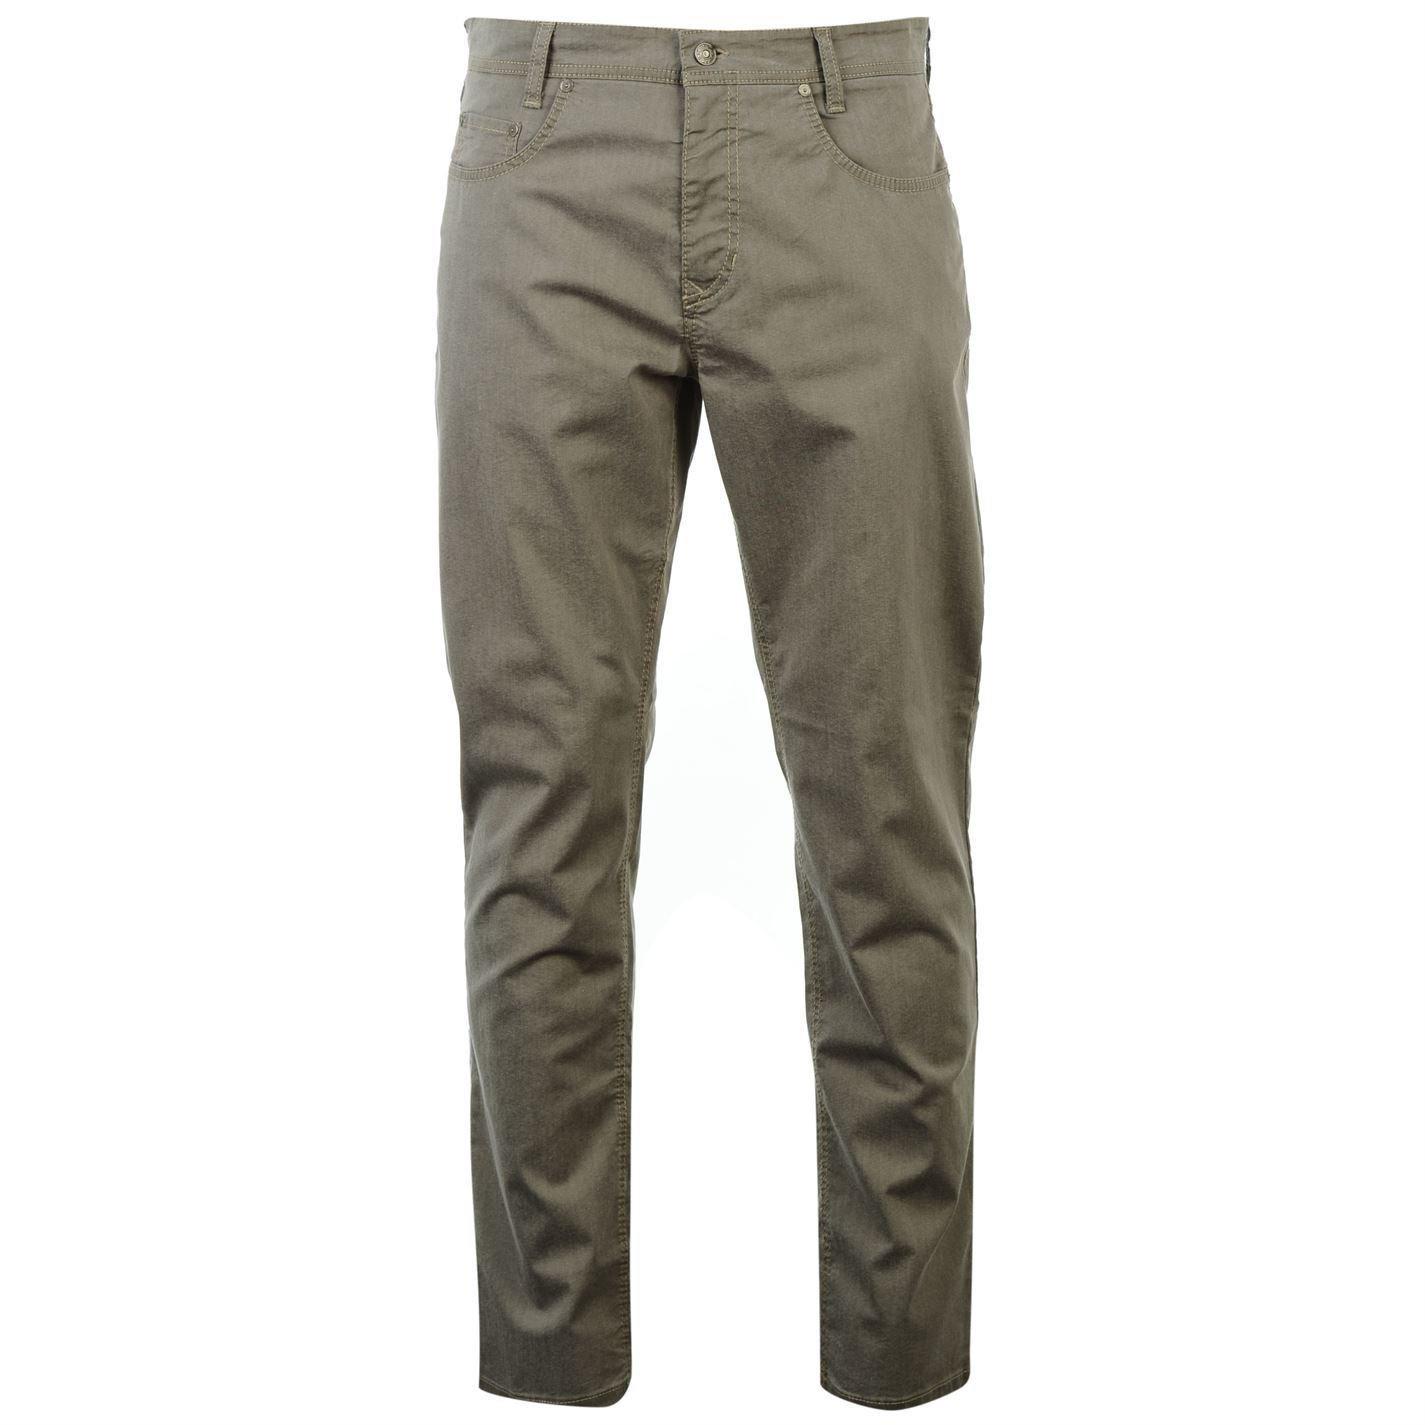 Mac Mens Arne Pants Trousers Everyday Casual Look Clothing